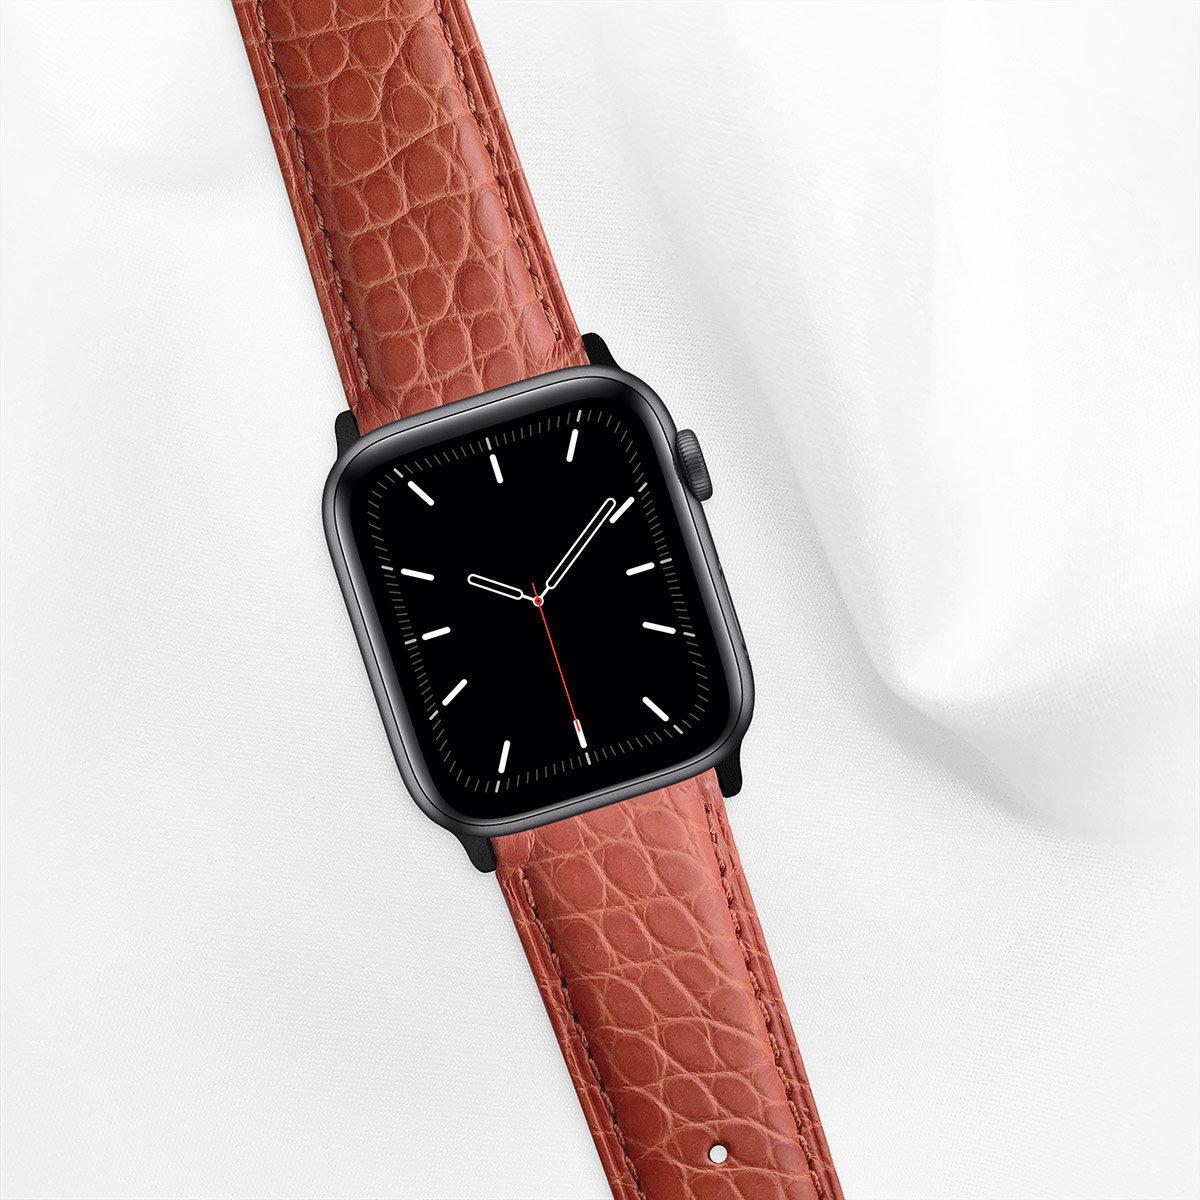 Matte Alligator 44mm Apple Watch 5 Strap, Ginger Orange, Round Scales, for Large Casing